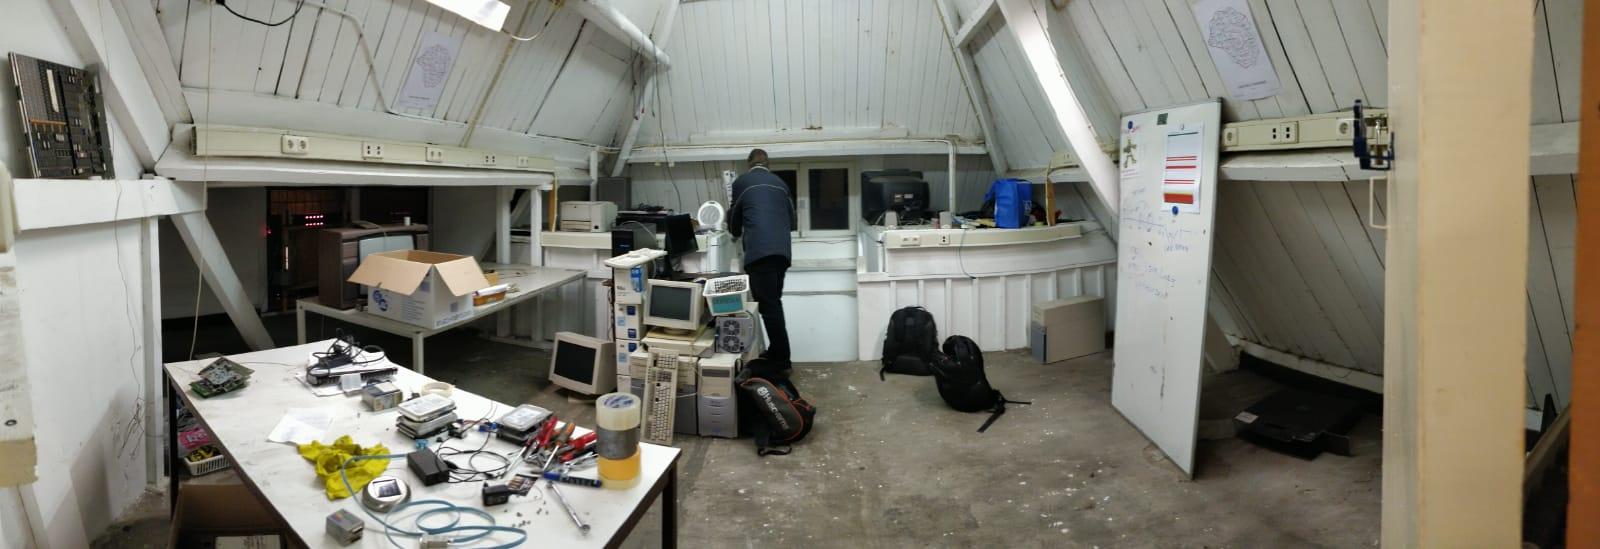 Opruimen en inpakken in de computerruimte